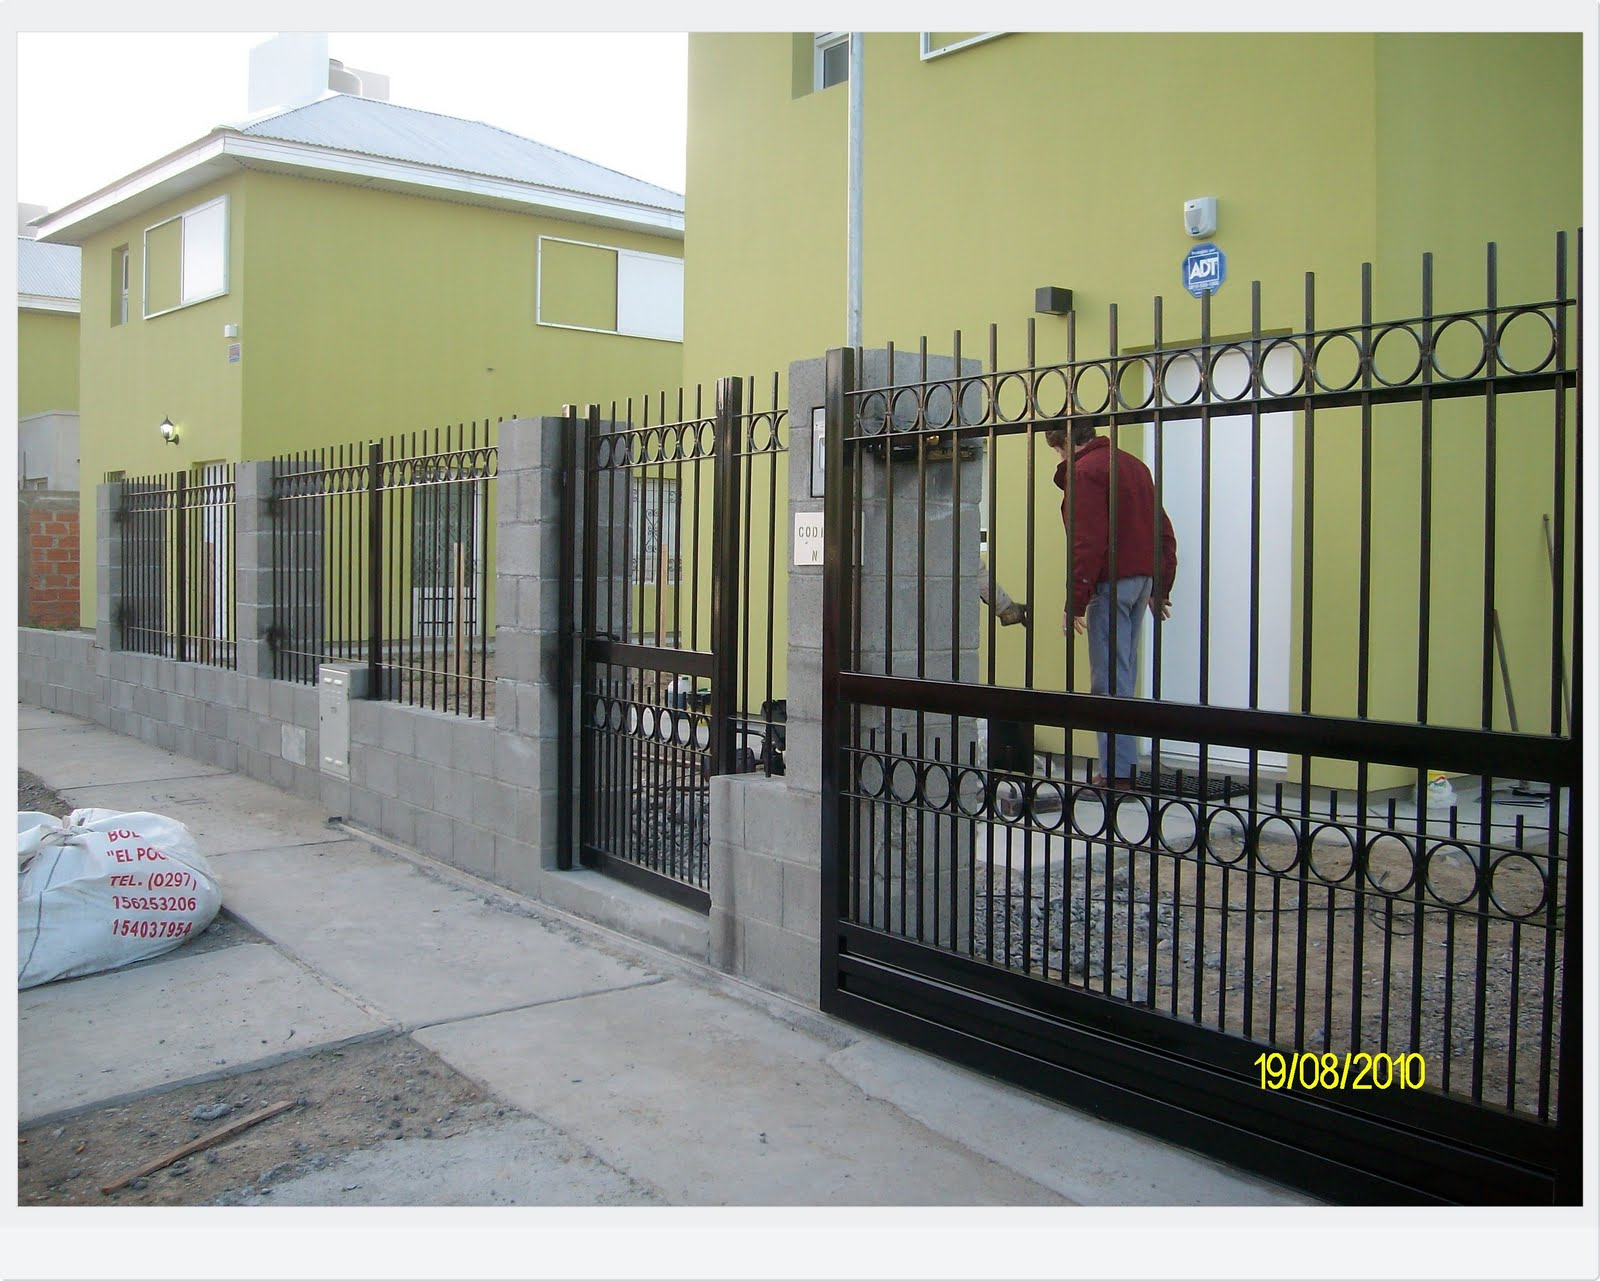 Metalurgica bacigaluppe cercos - Fiche de poste vendeuse pret a porter ...